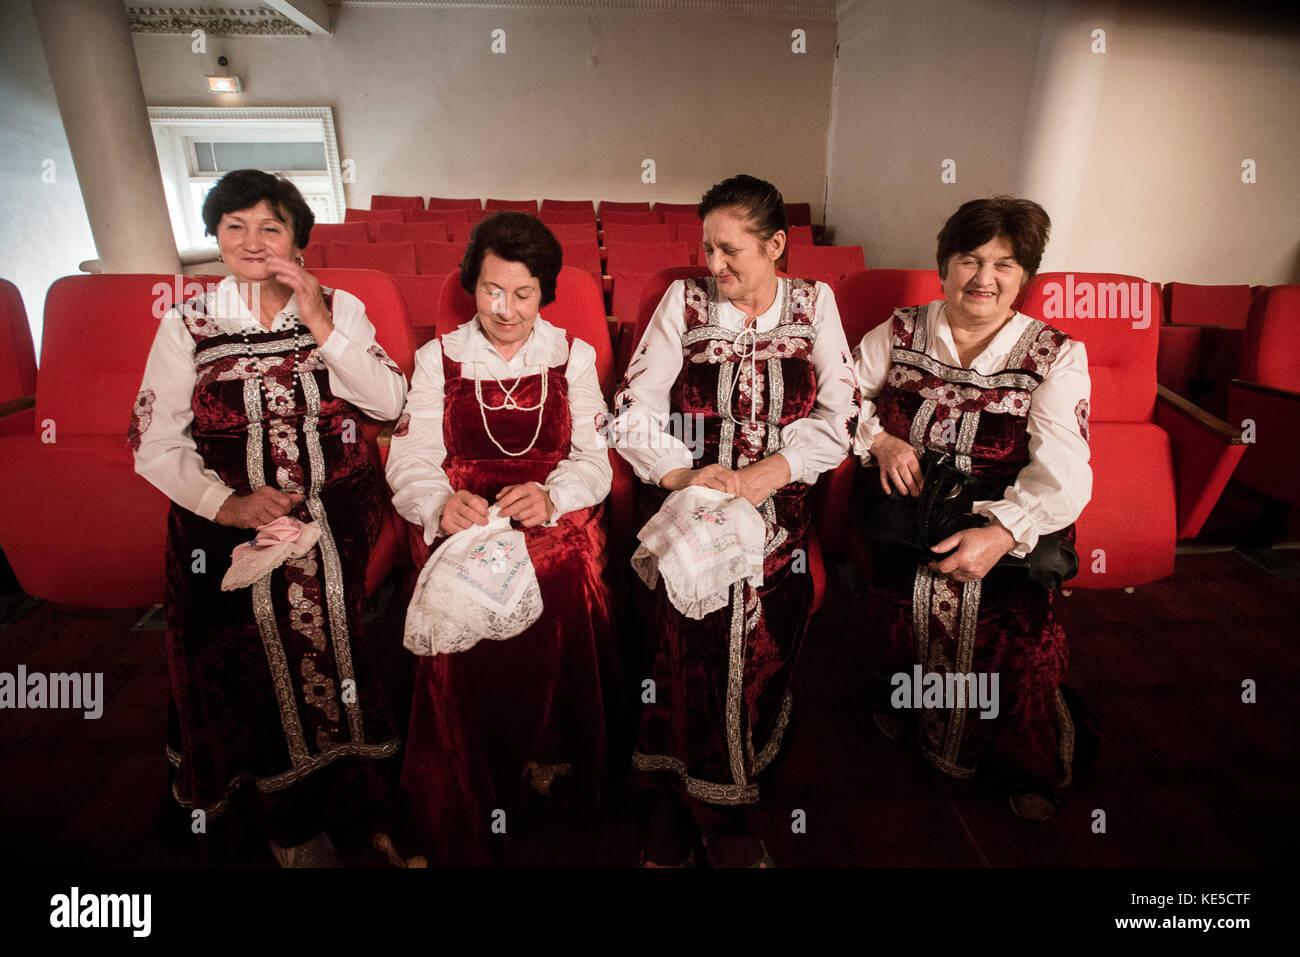 slavyanka chorus sing traditional